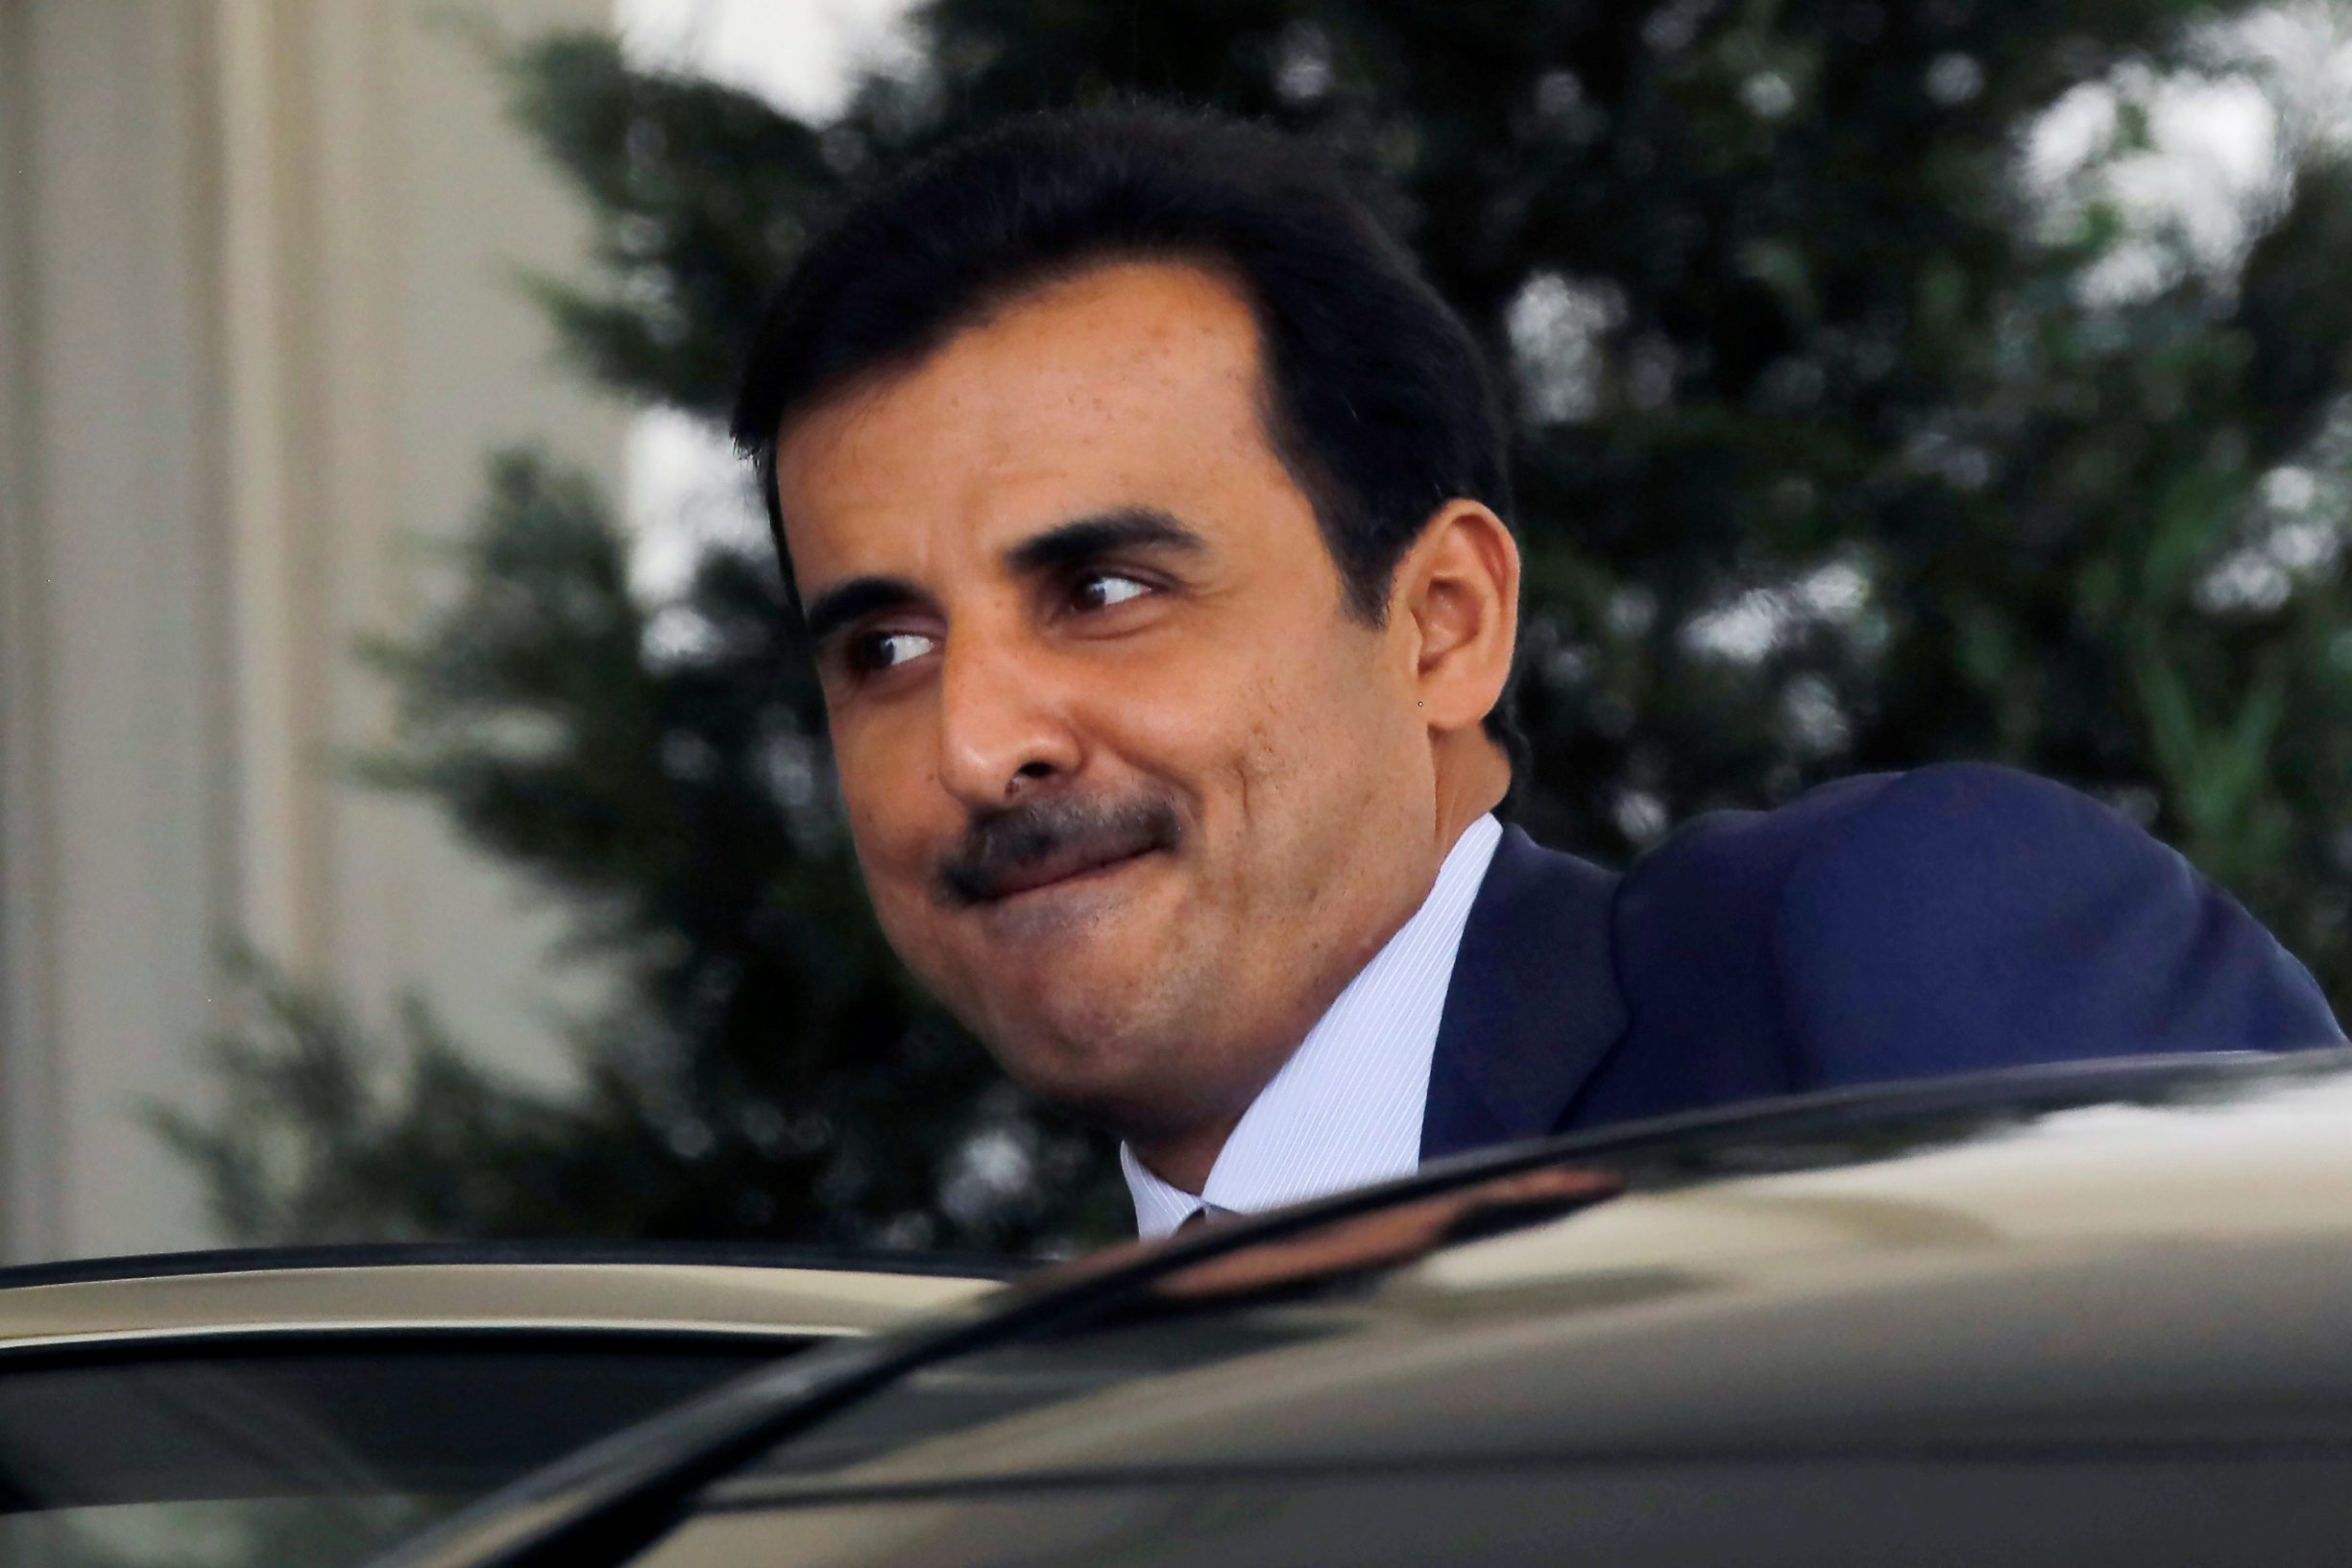 Qatar's Emir Sheikh Tamim bin Hamad Al-Thani departs the White House after a meeting with U.S. President Donald Trump in Washington, U.S., July 9, 2019. REUTERS/Carlos Barria